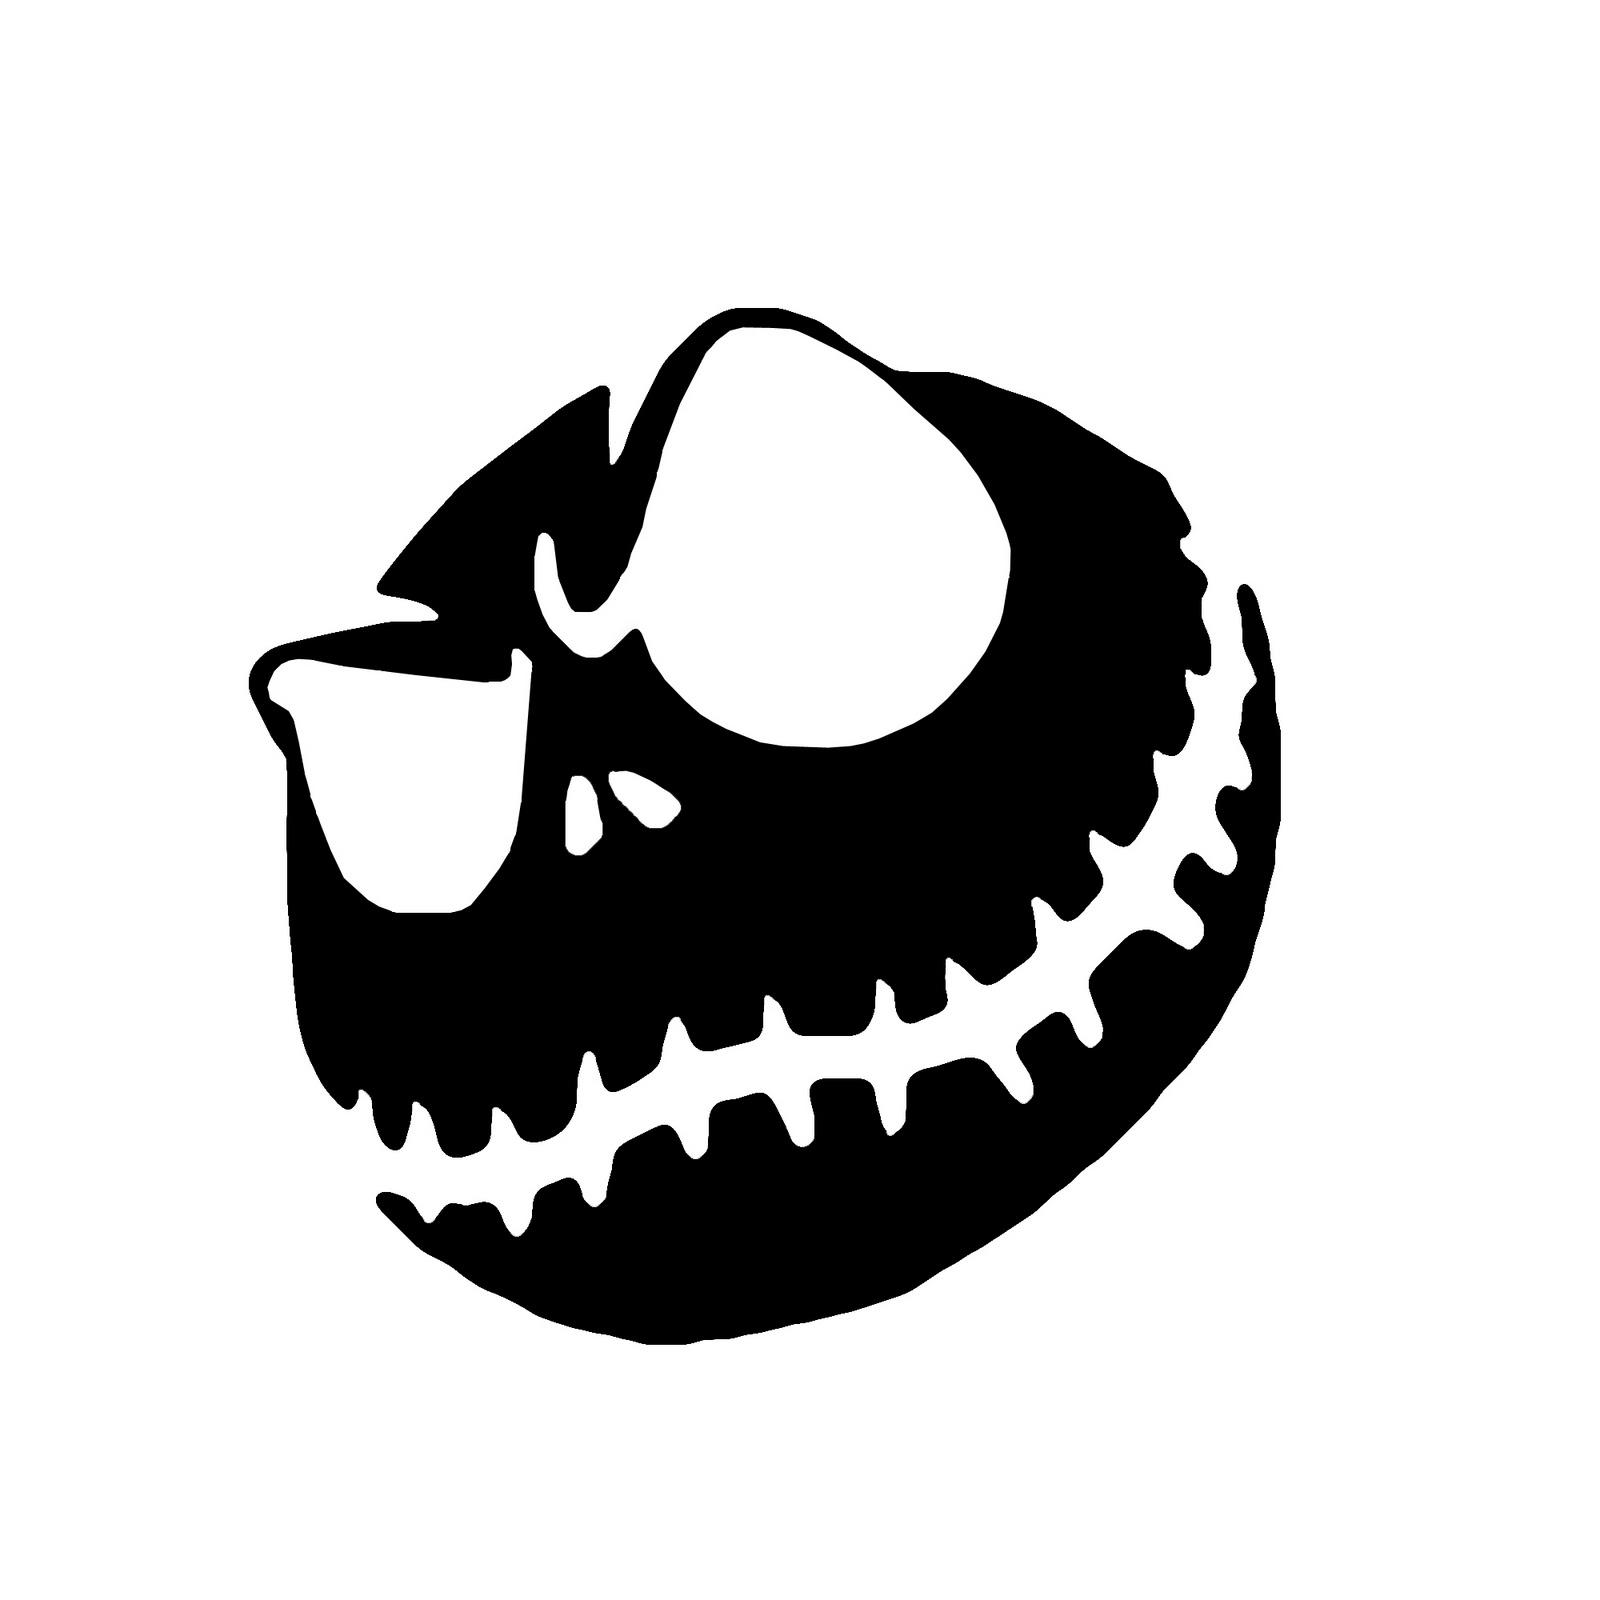 Free Guitar Pumpkin Stencil Download Free Clip Art Free Clip Art On Clipart Library